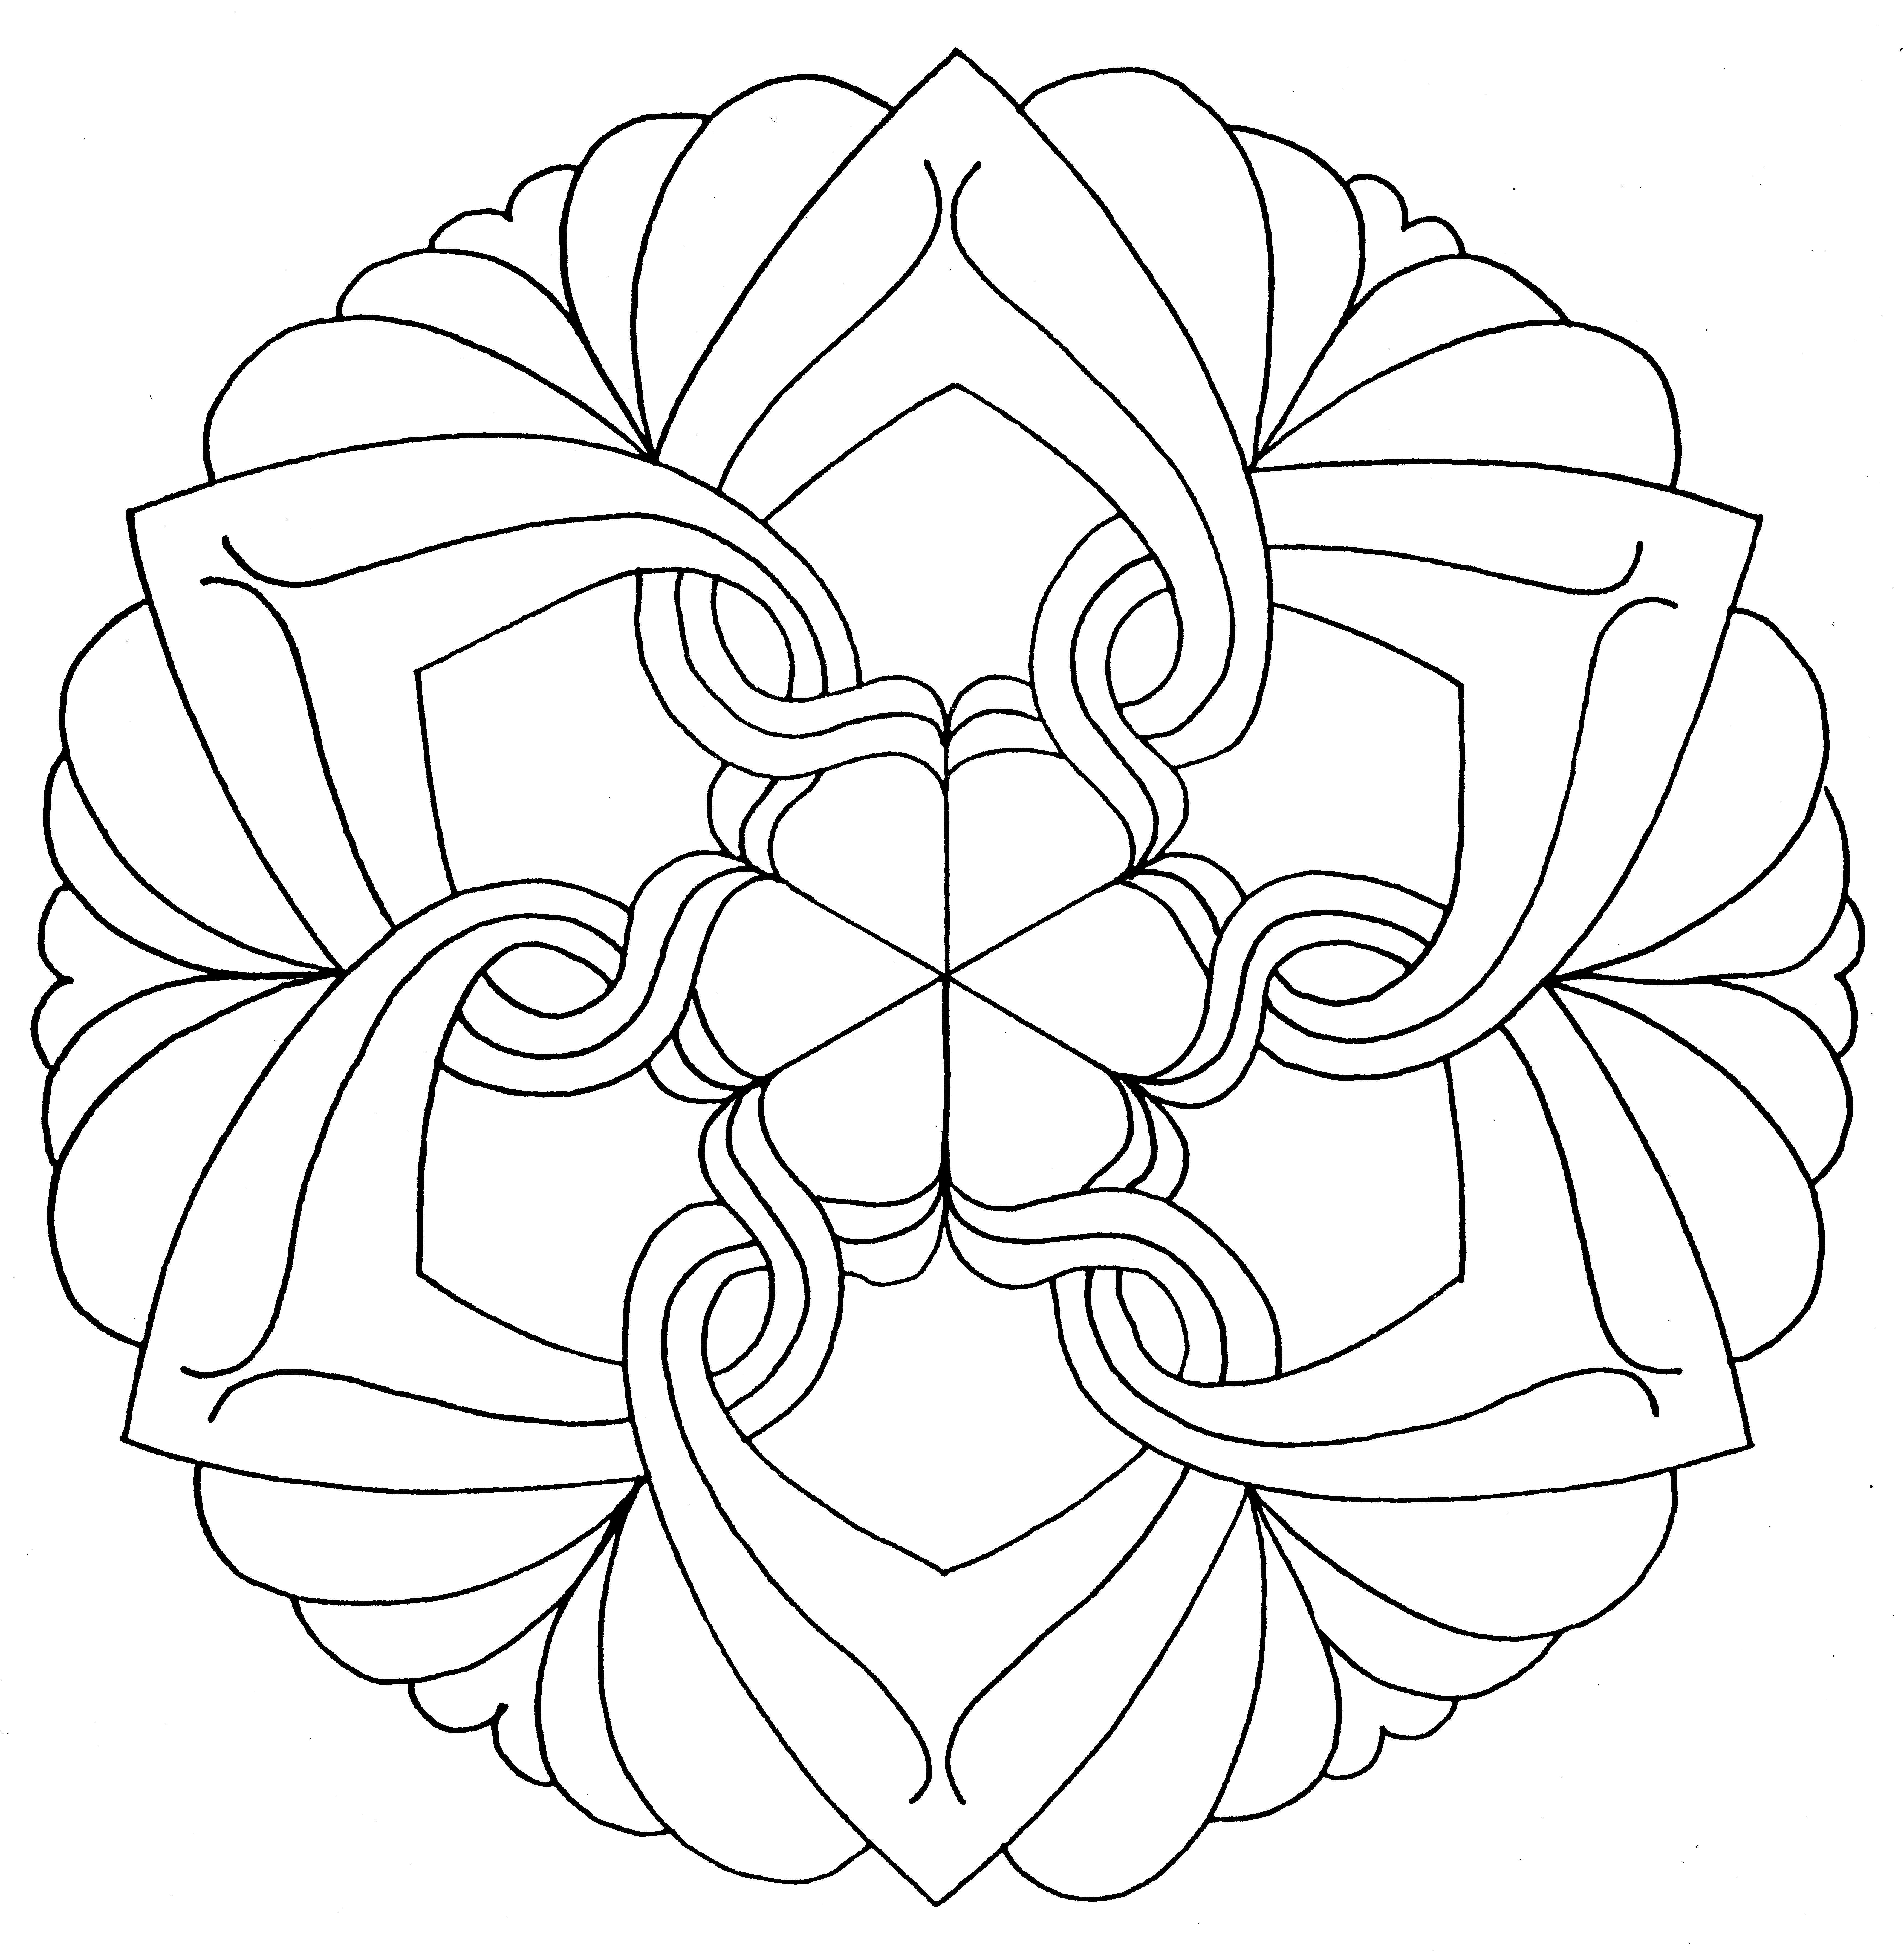 Pin de Kayle Ayers en *Adult Coloring | Printables* | Pinterest ...